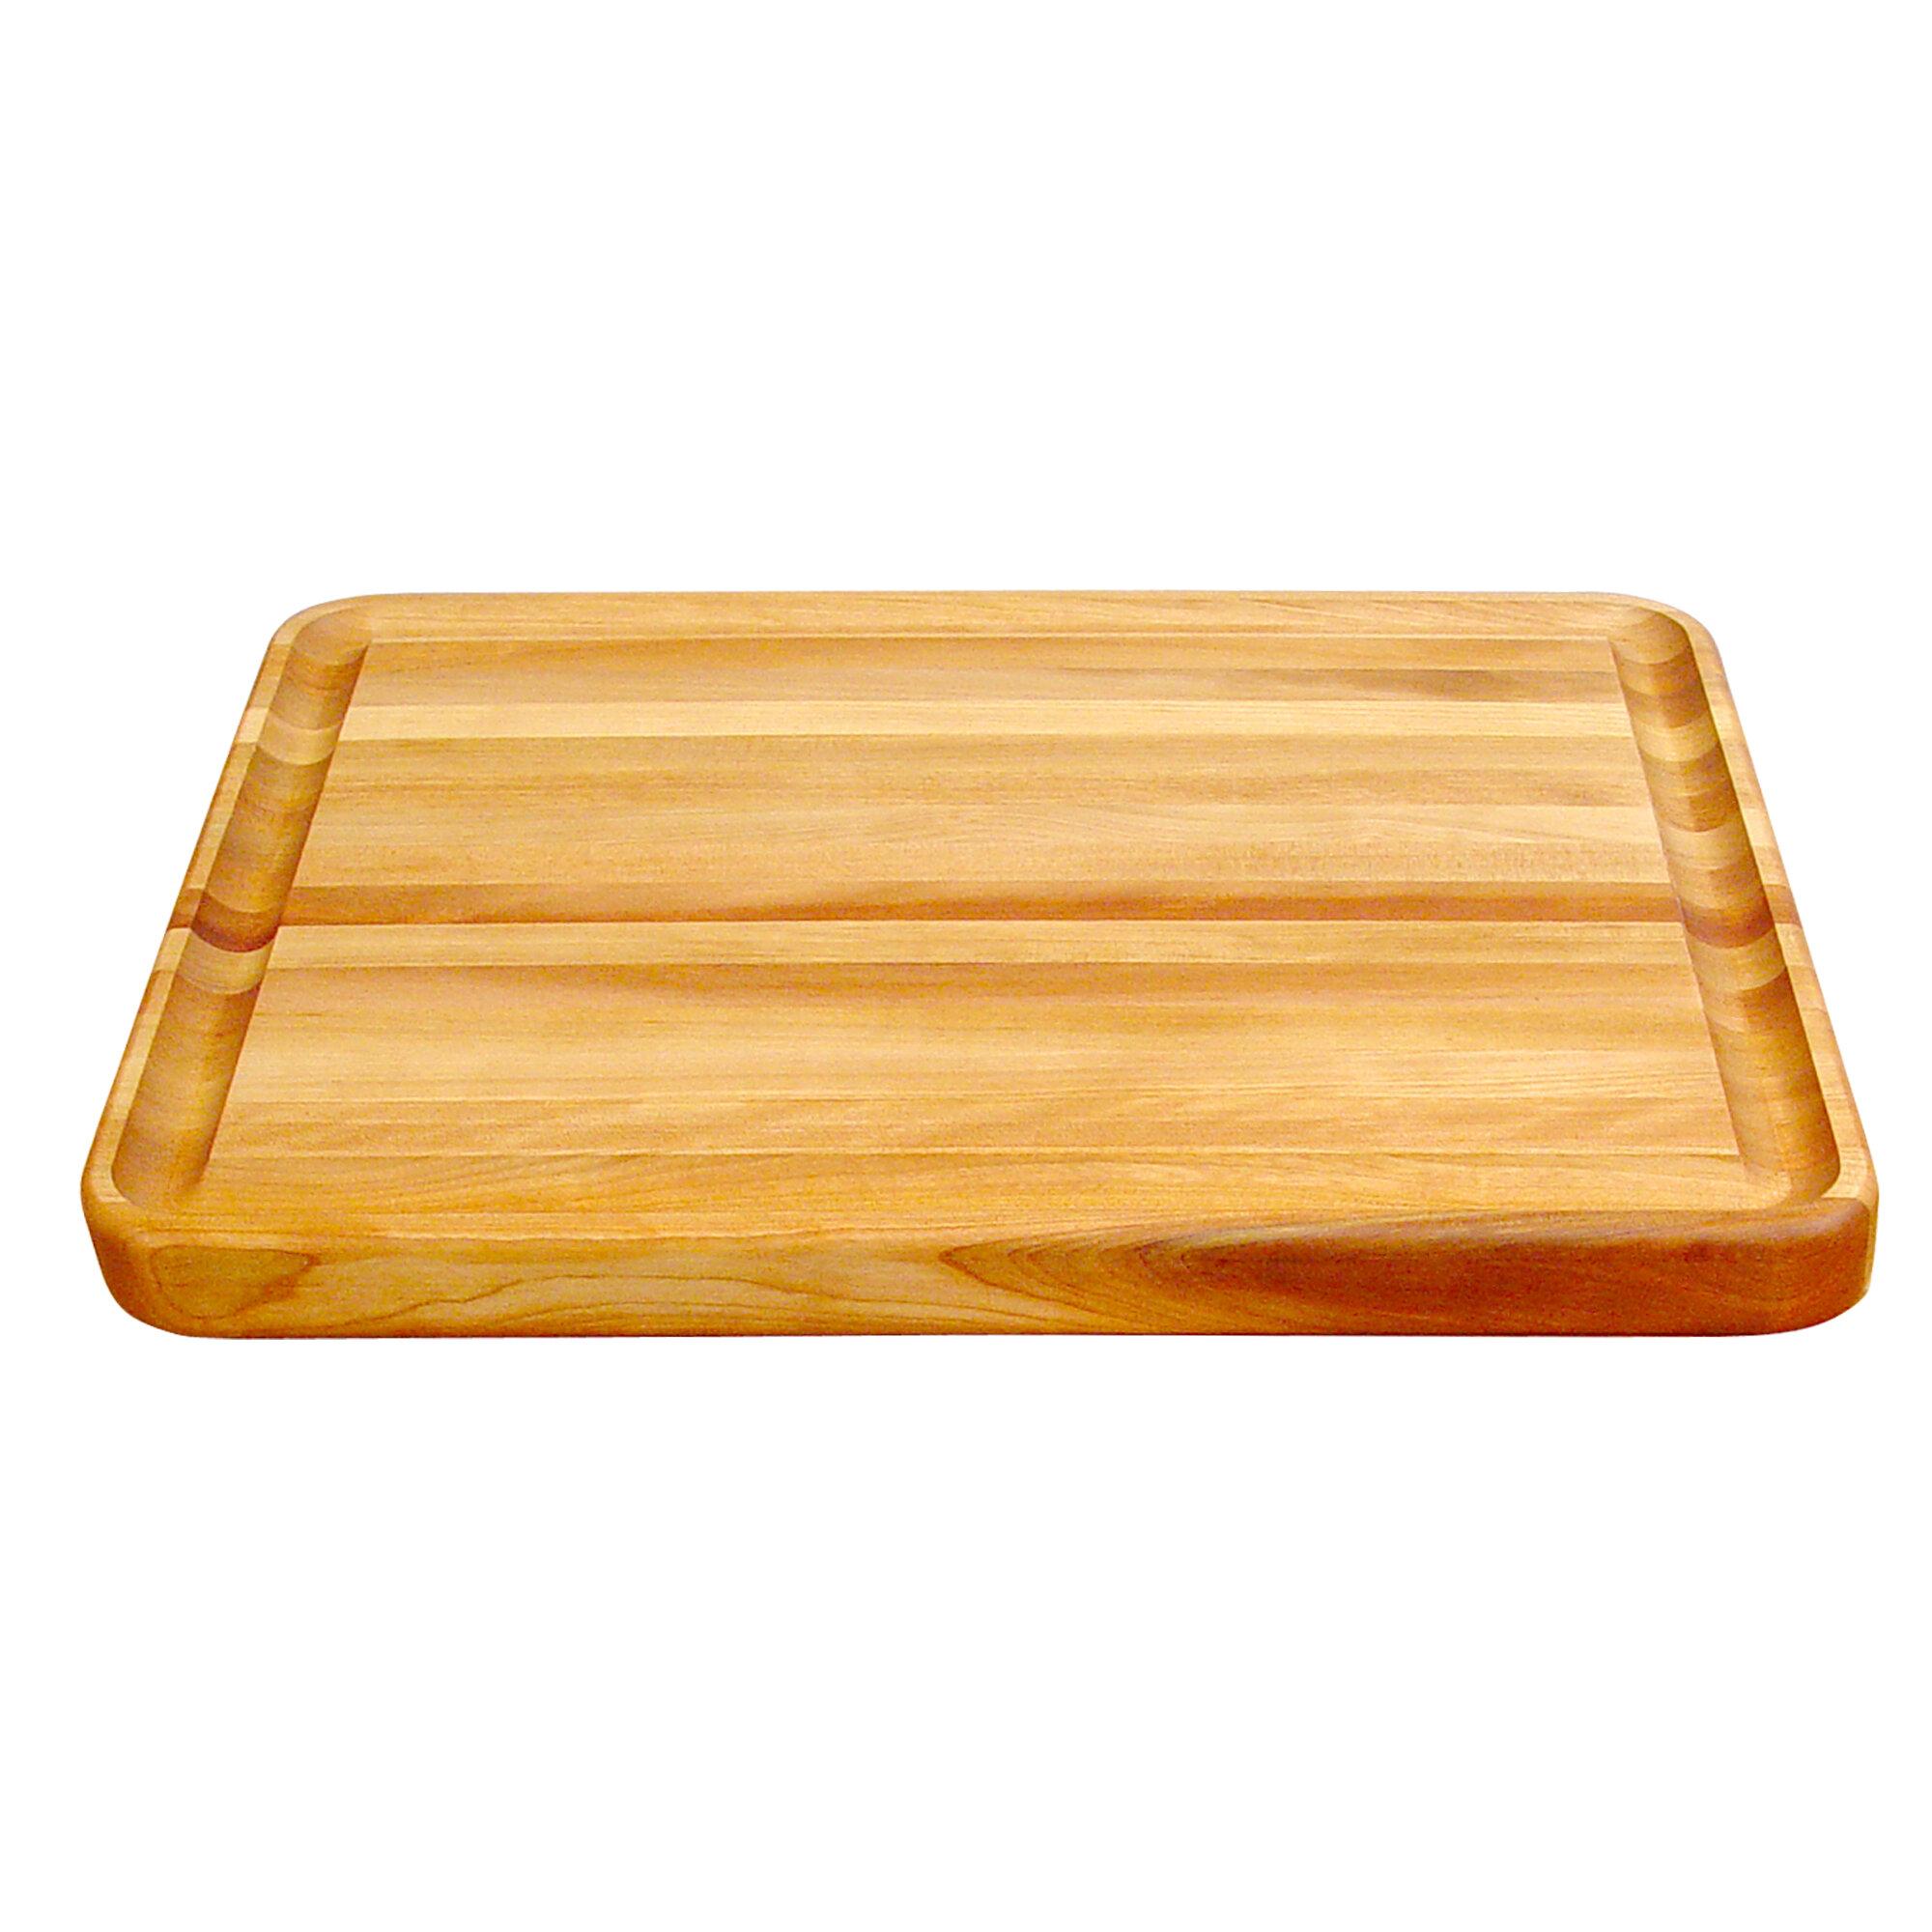 Catskill Craftsmen, Inc. Professional Style Wood Cutting Board